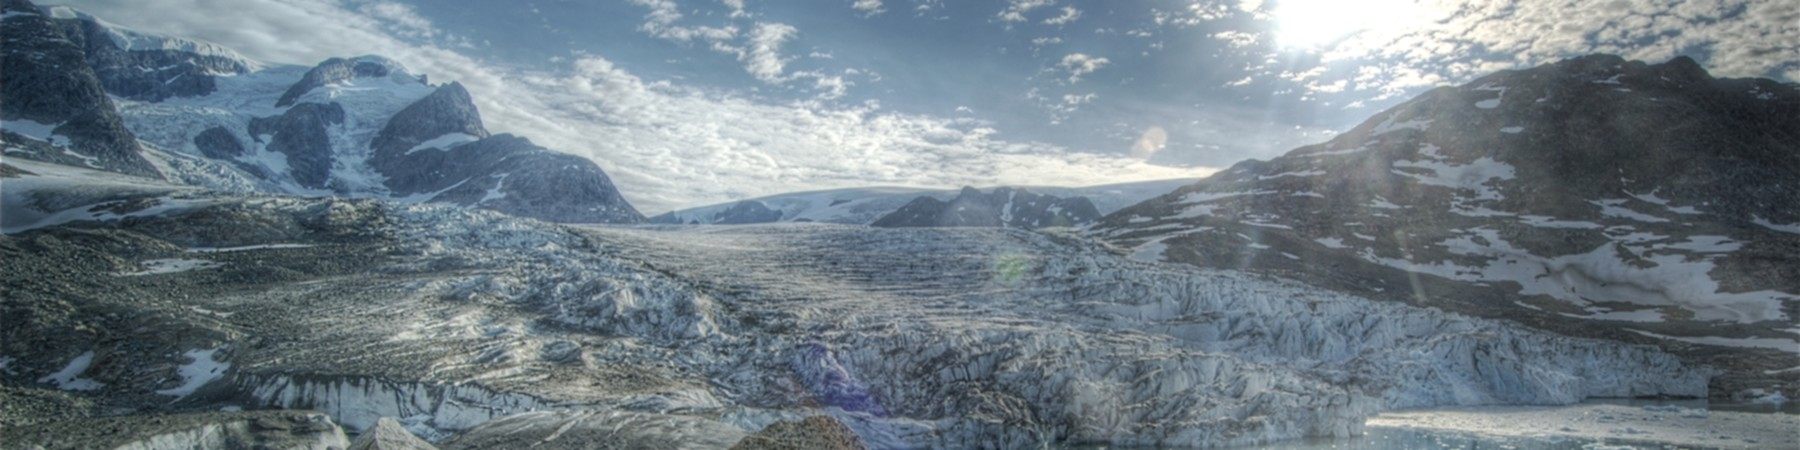 Greenland Wikitravel